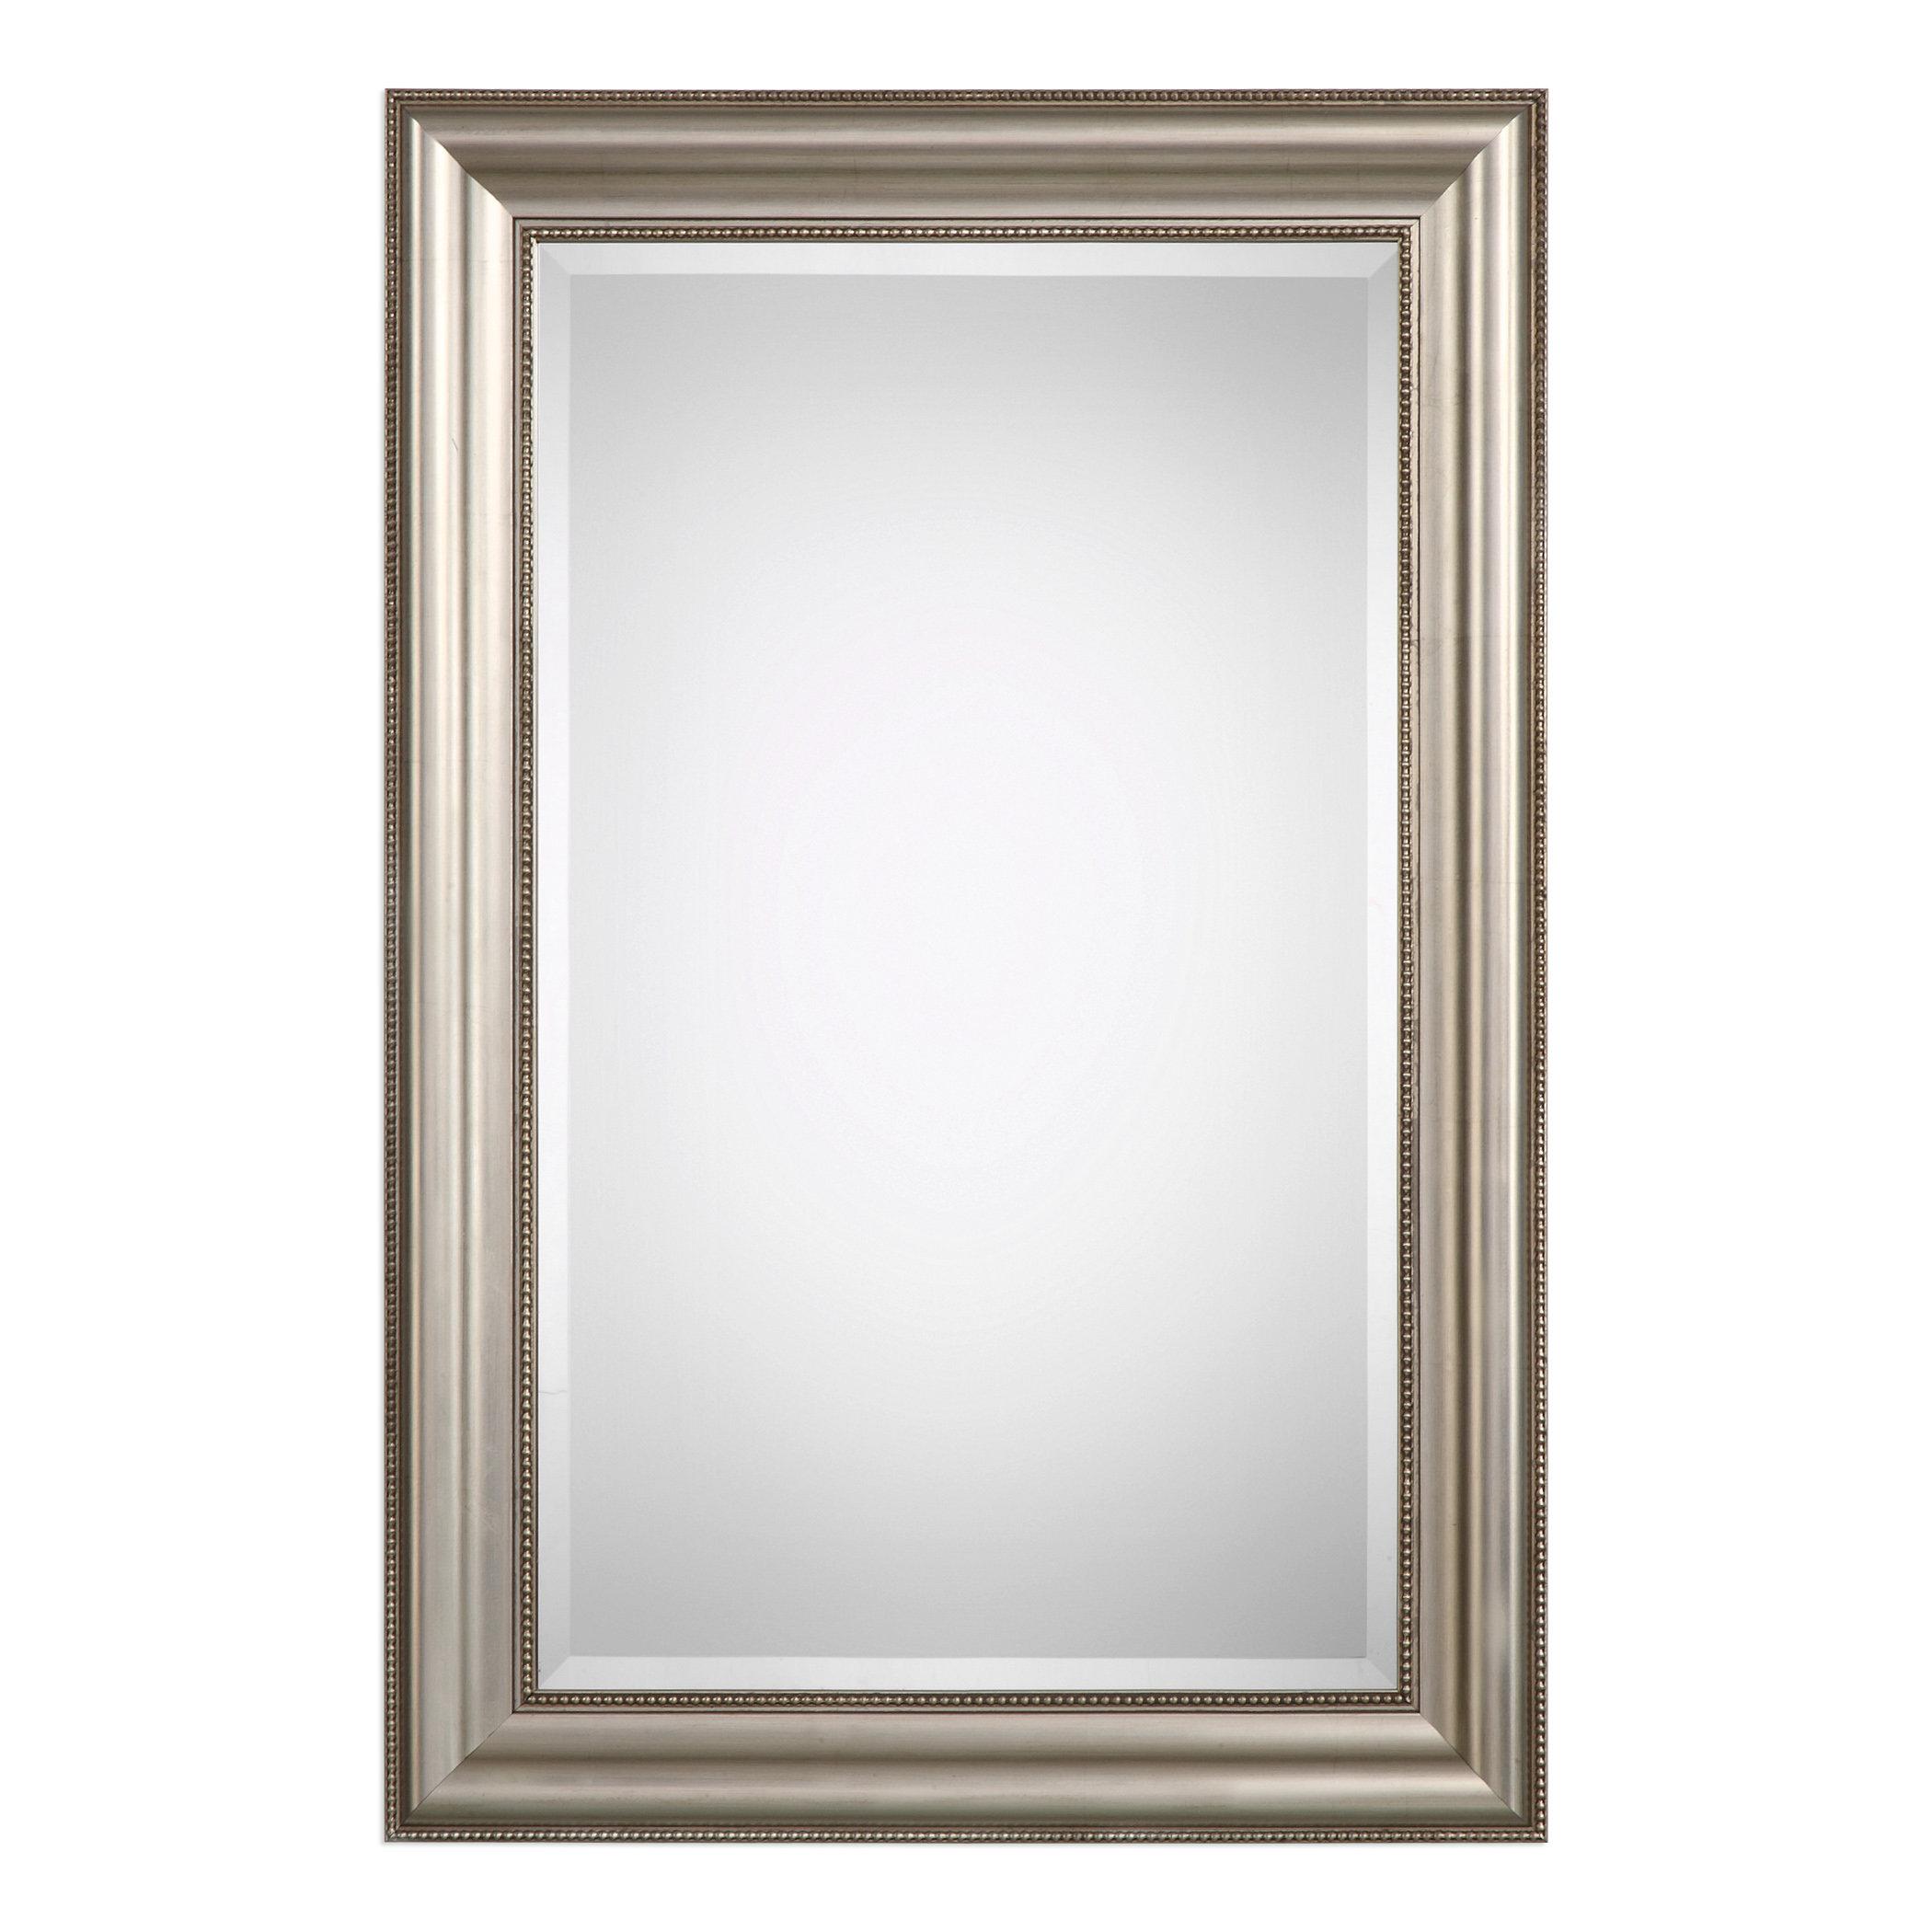 Farmhouse Mirrors | Birch Lane In Peetz Modern Rustic Accent Mirrors (View 30 of 30)